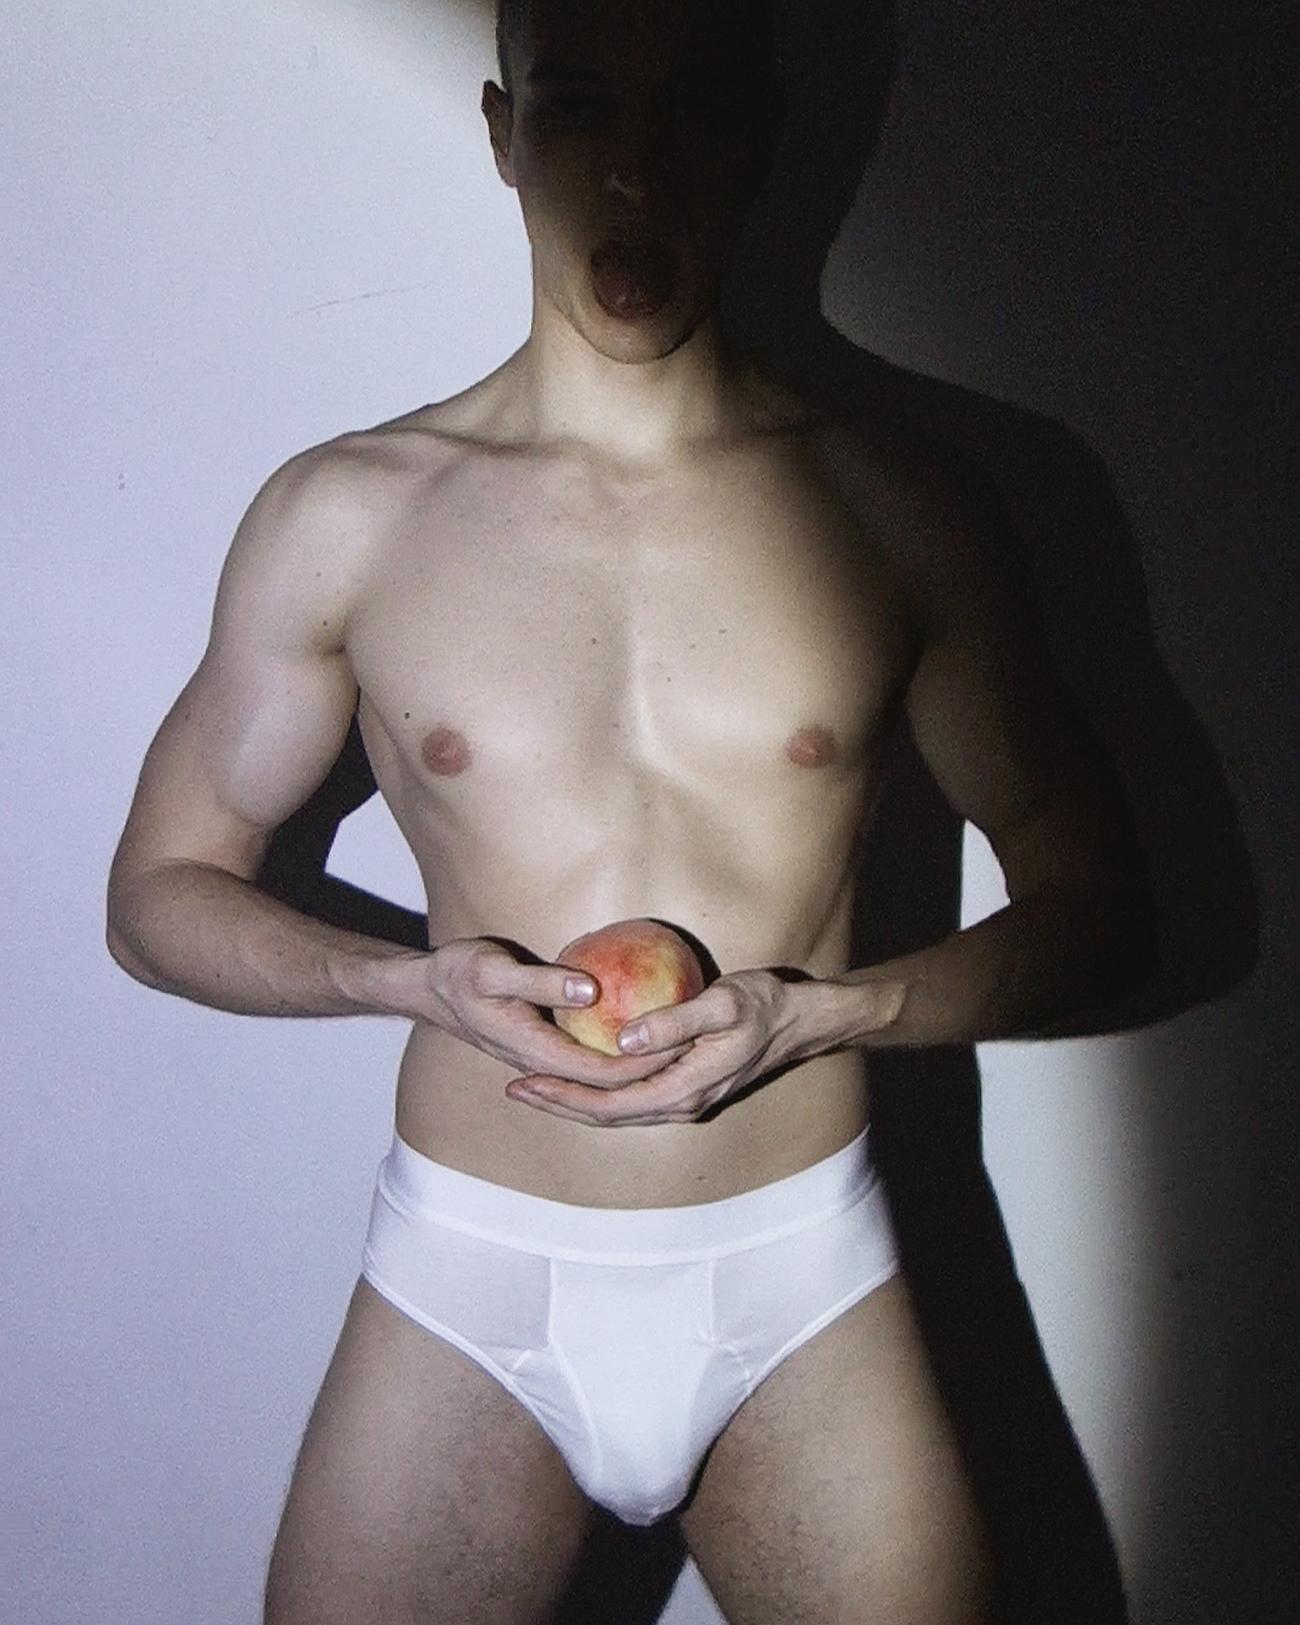 Ron Wan photographing Dmitrii B from Quest Artist in Sheung Wan, Hong Kong.